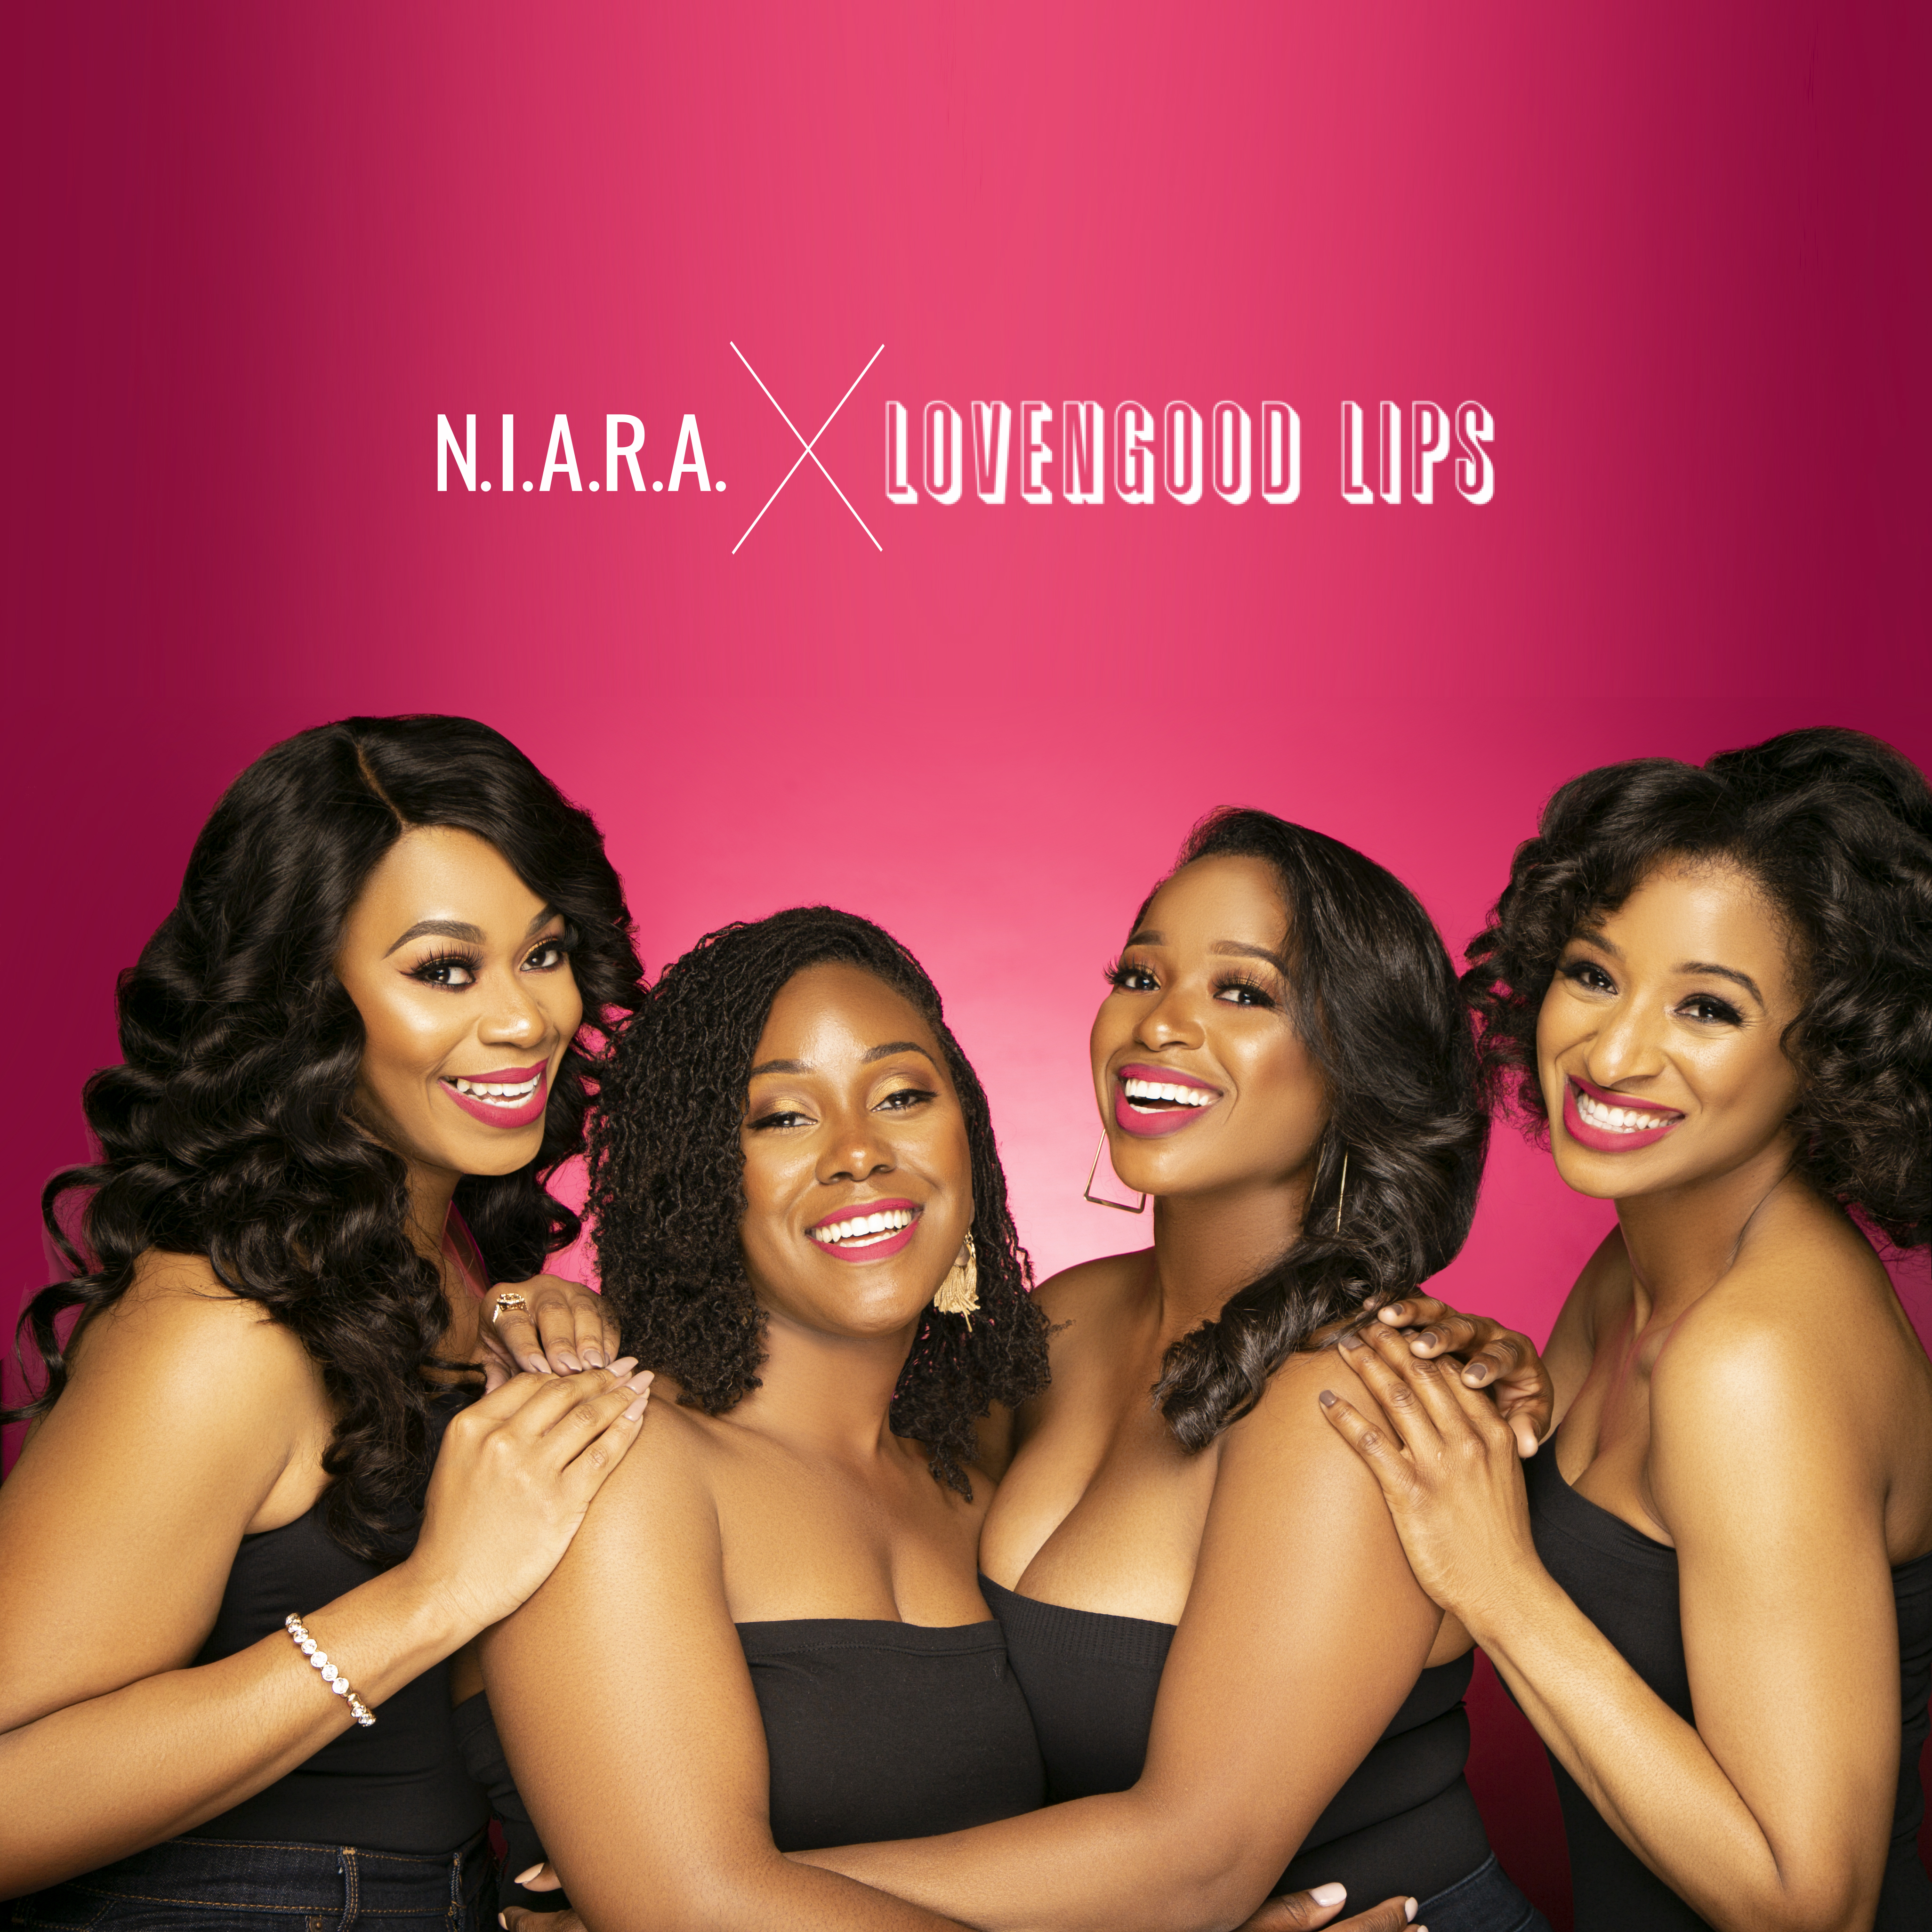 N.I.A.R.A. x Lovengood Lips